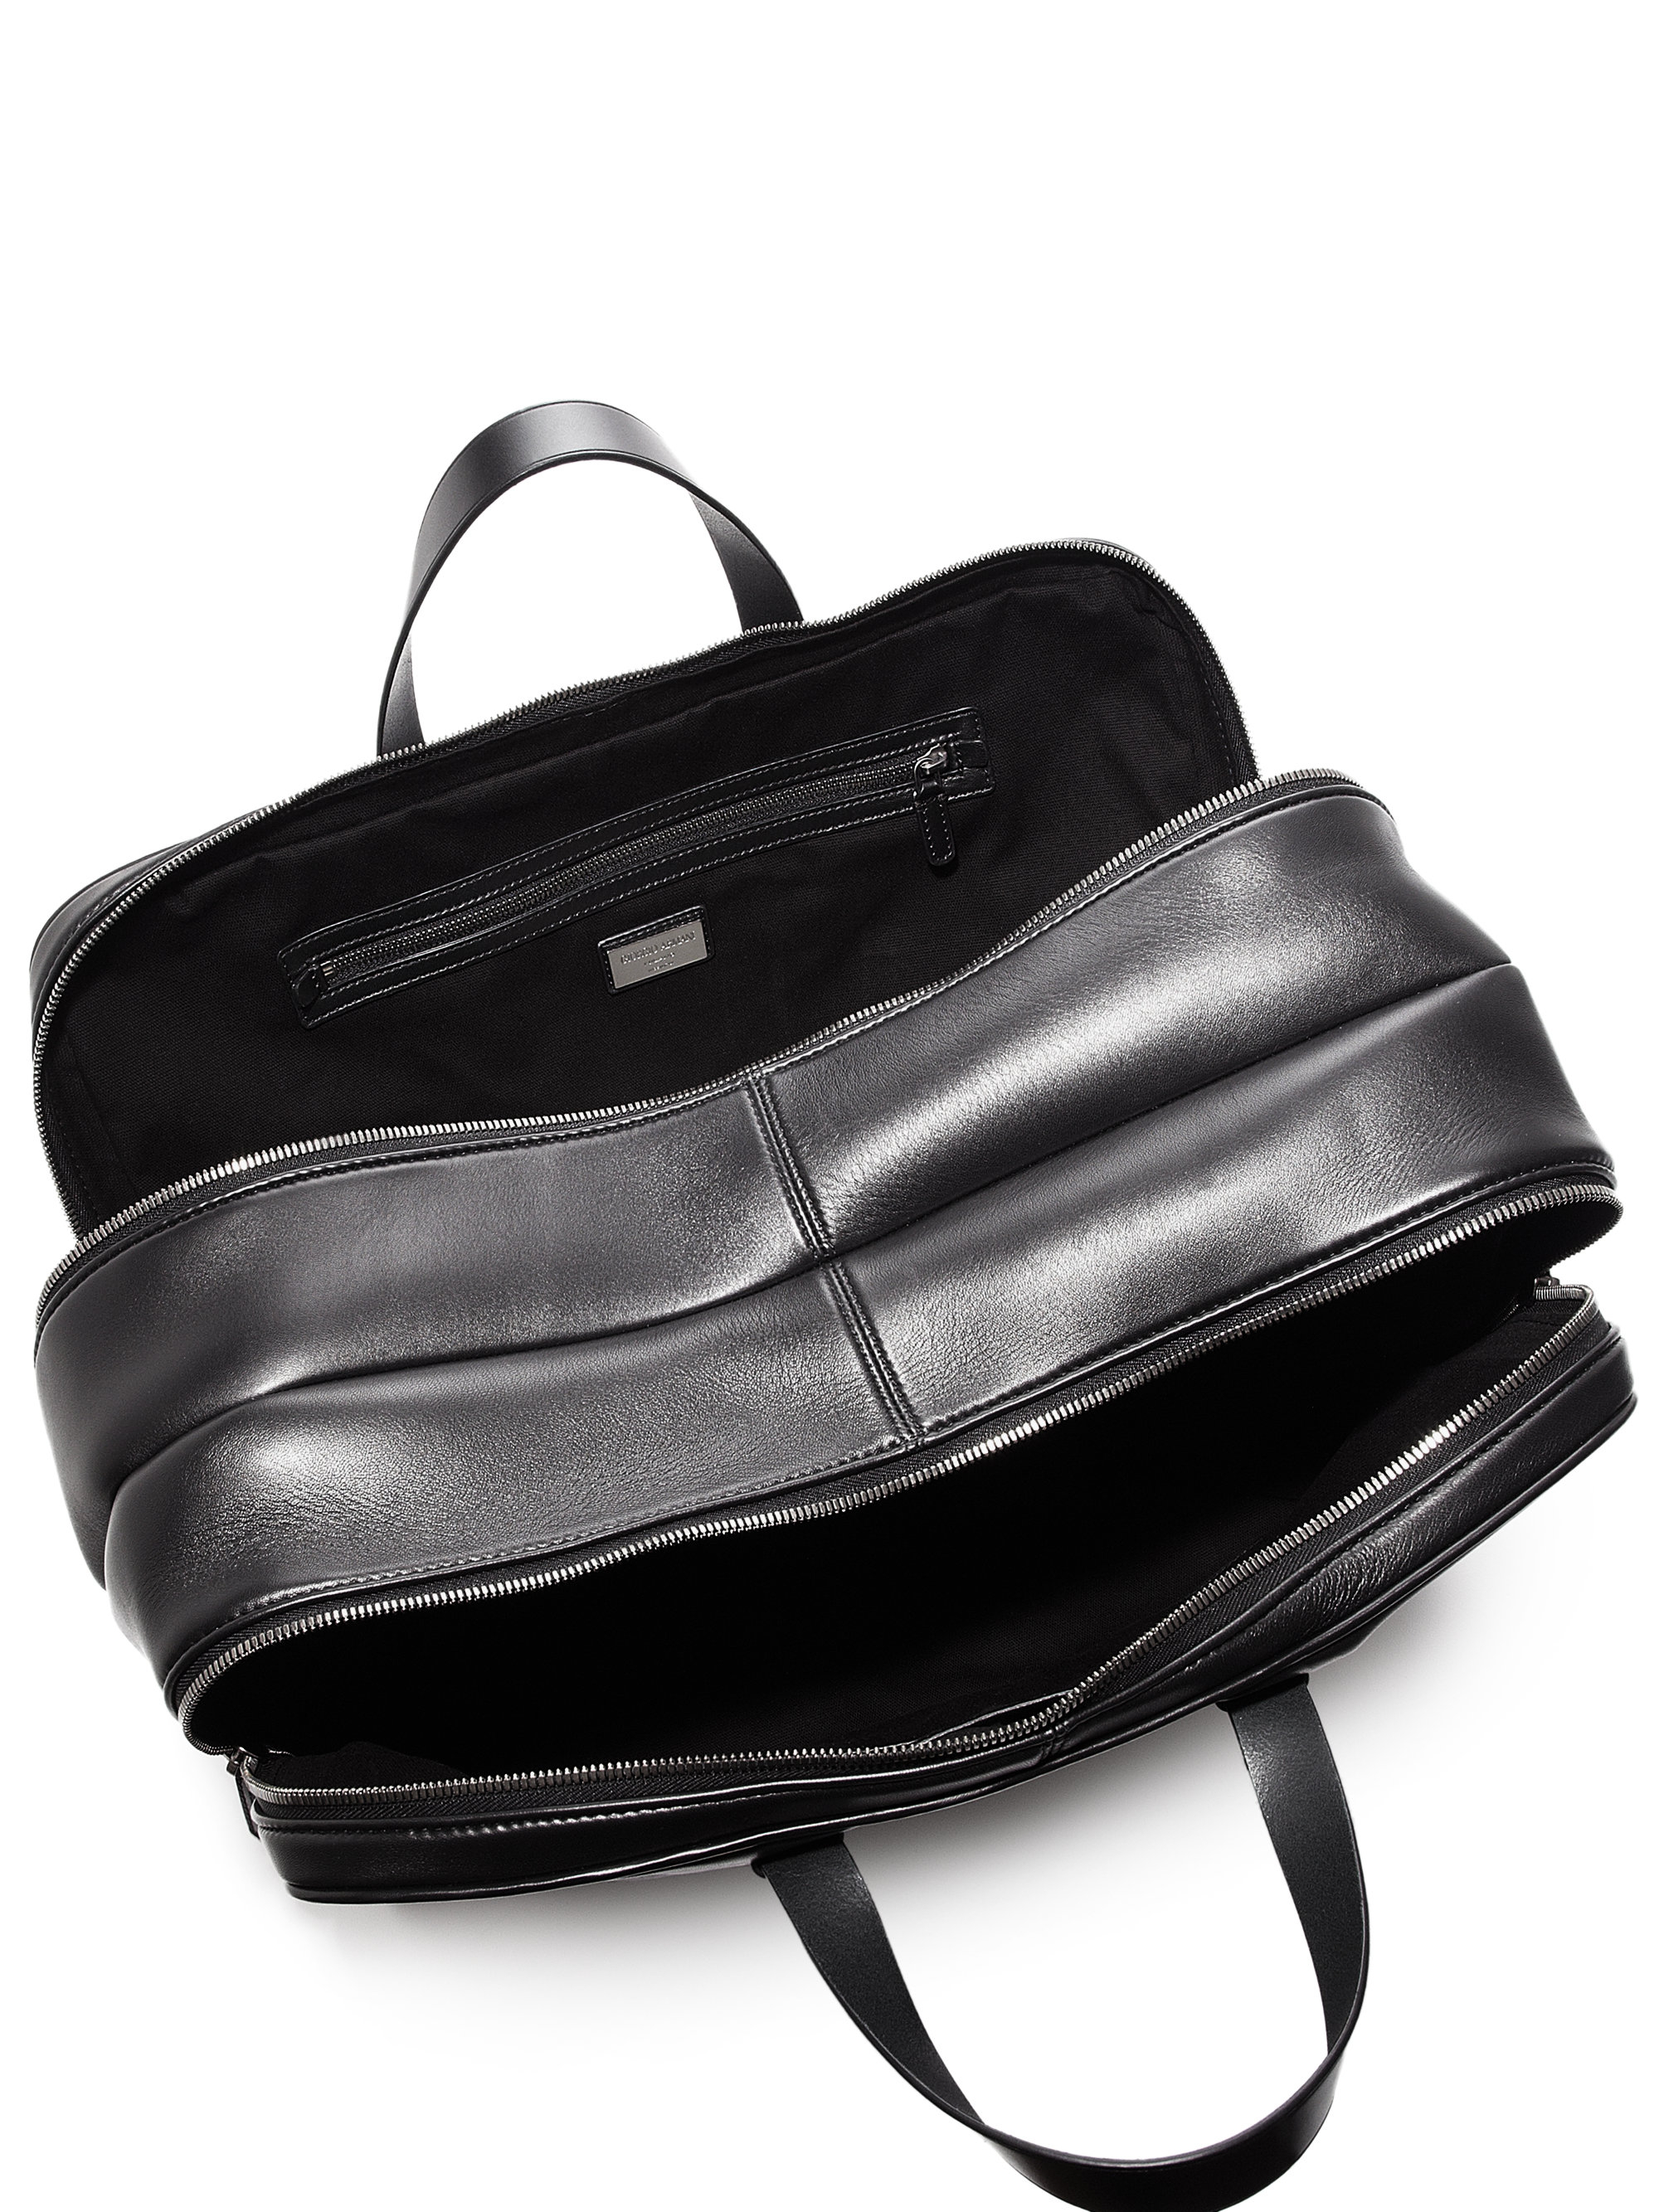 Lyst - Giorgio Armani Smooth Leather Weekender Bag in Black for Men 91ff2b75802ff